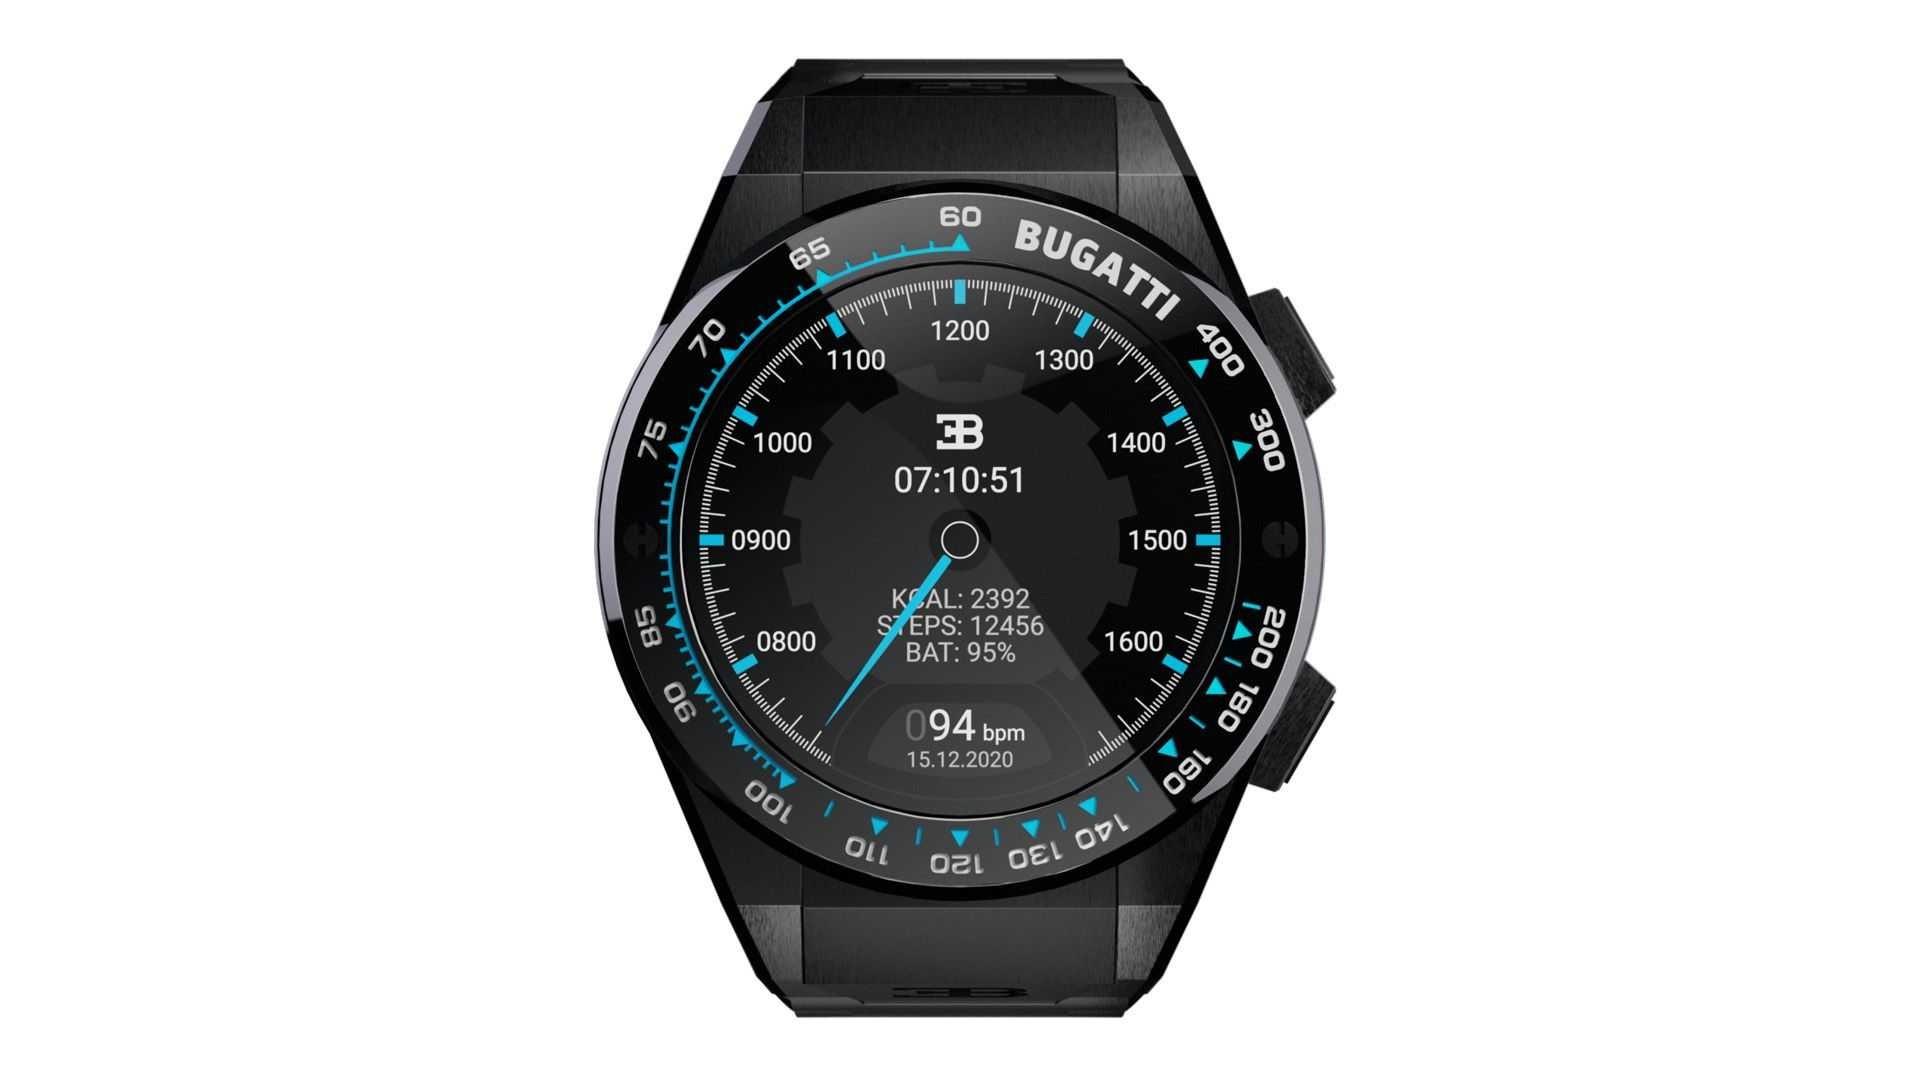 Bugatti_Smartwatch-0002